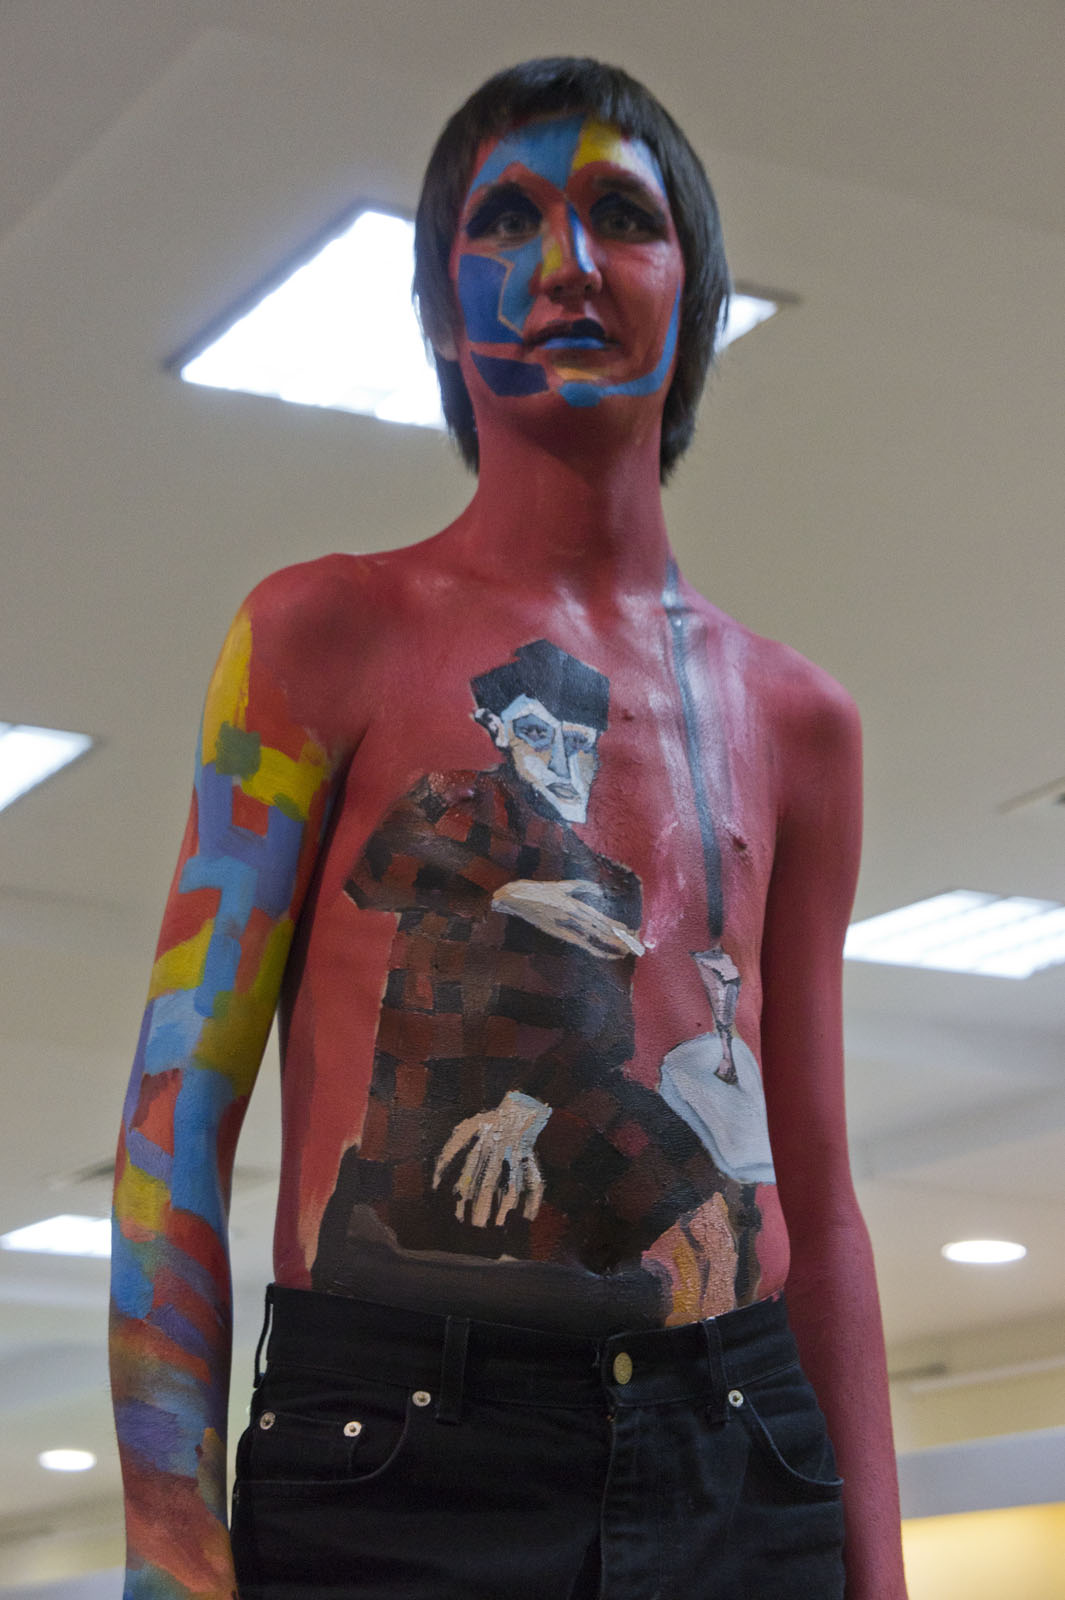 Фото №78149. Третье место в конкурсе «Body-Art Battle» в Манеже